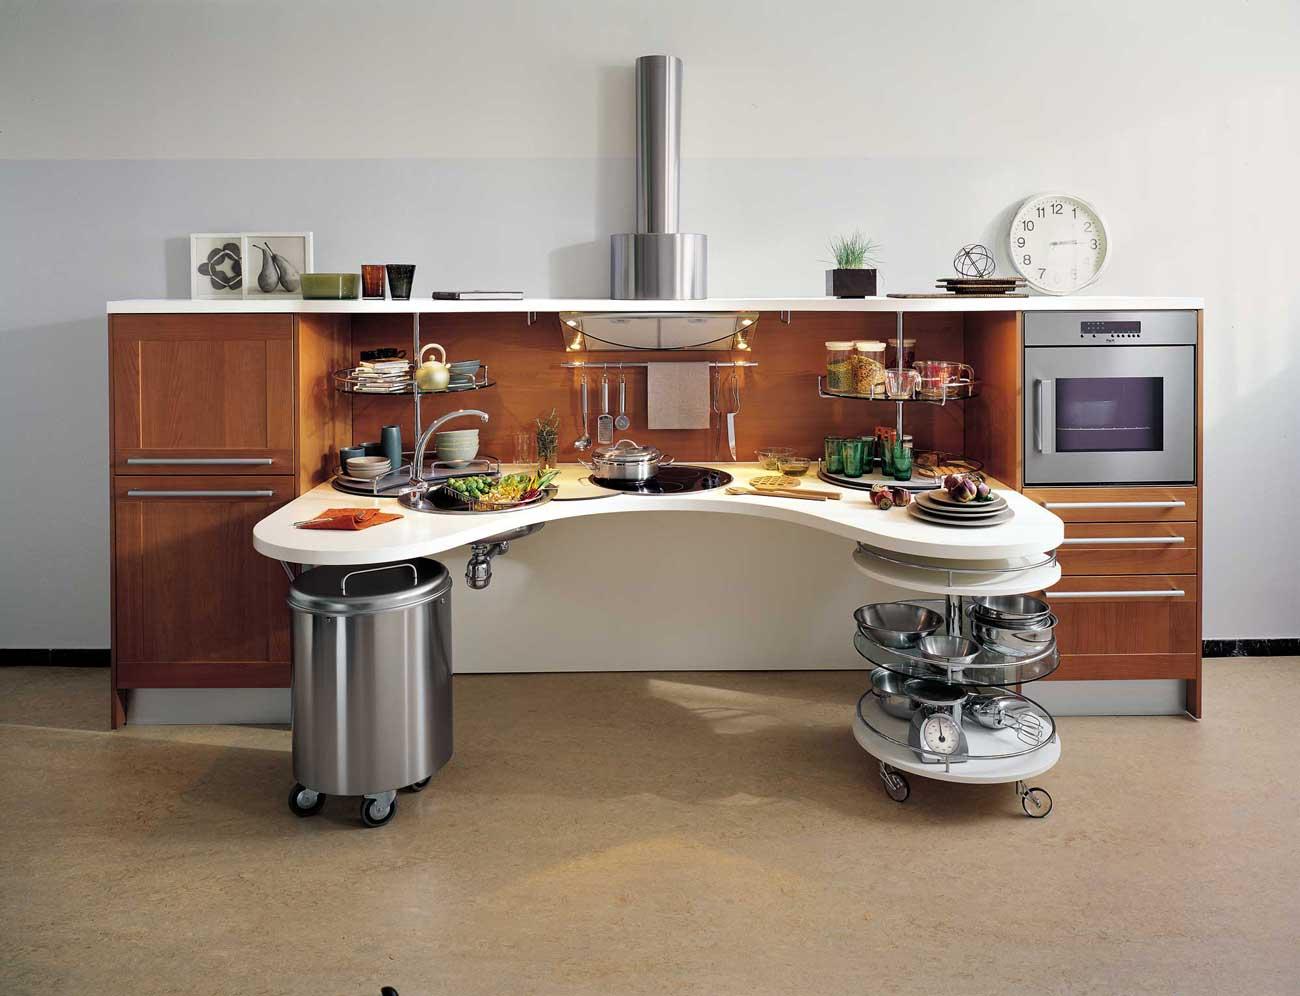 Snaidero skyline lab kitchen wood - Minacciolo cuisine ...